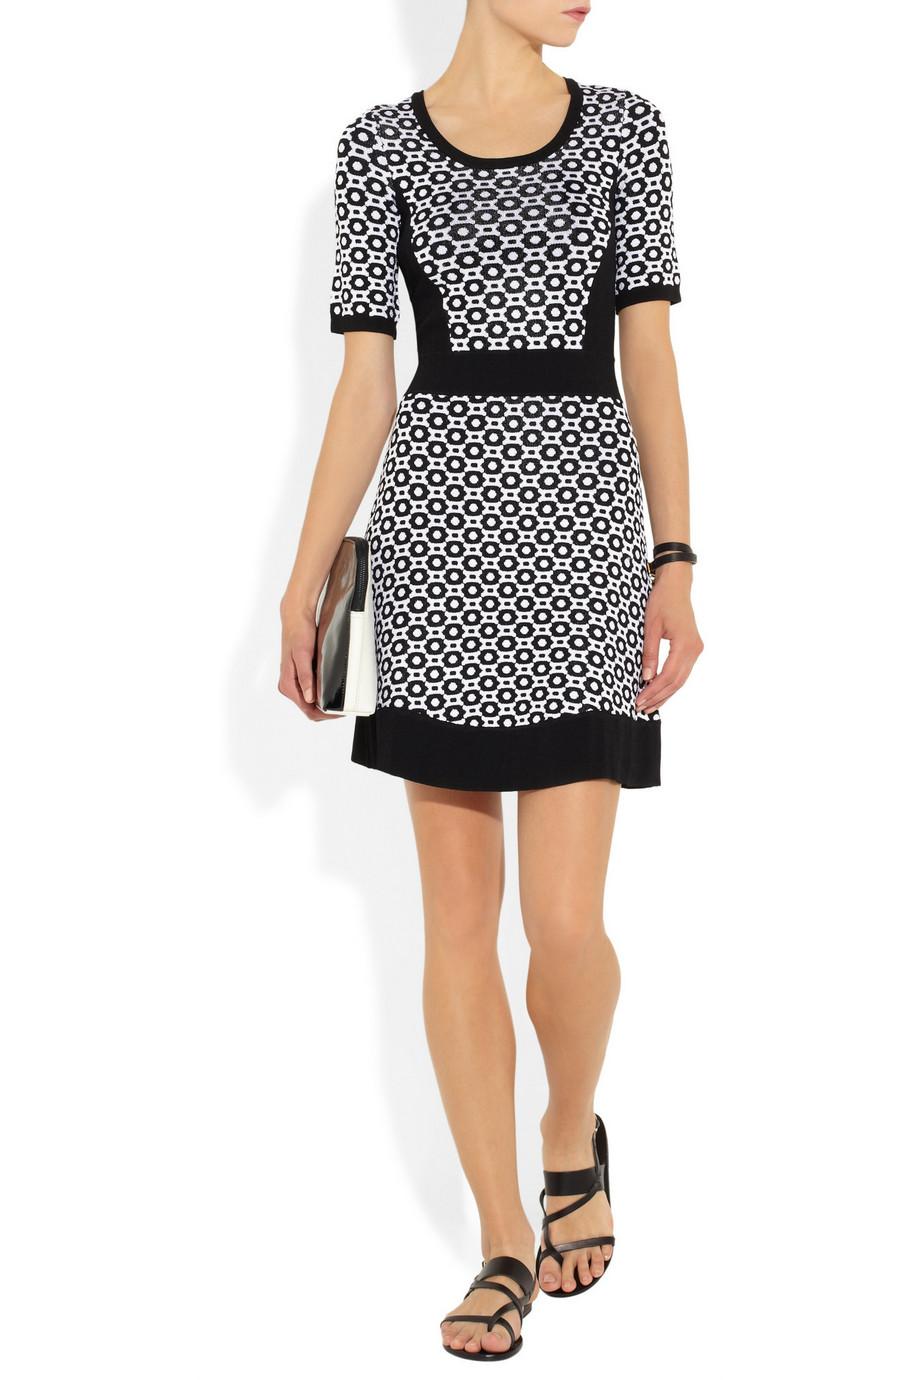 rag & bone Gabi Stretch-knit Dress | Day to Night Dresses for Fall